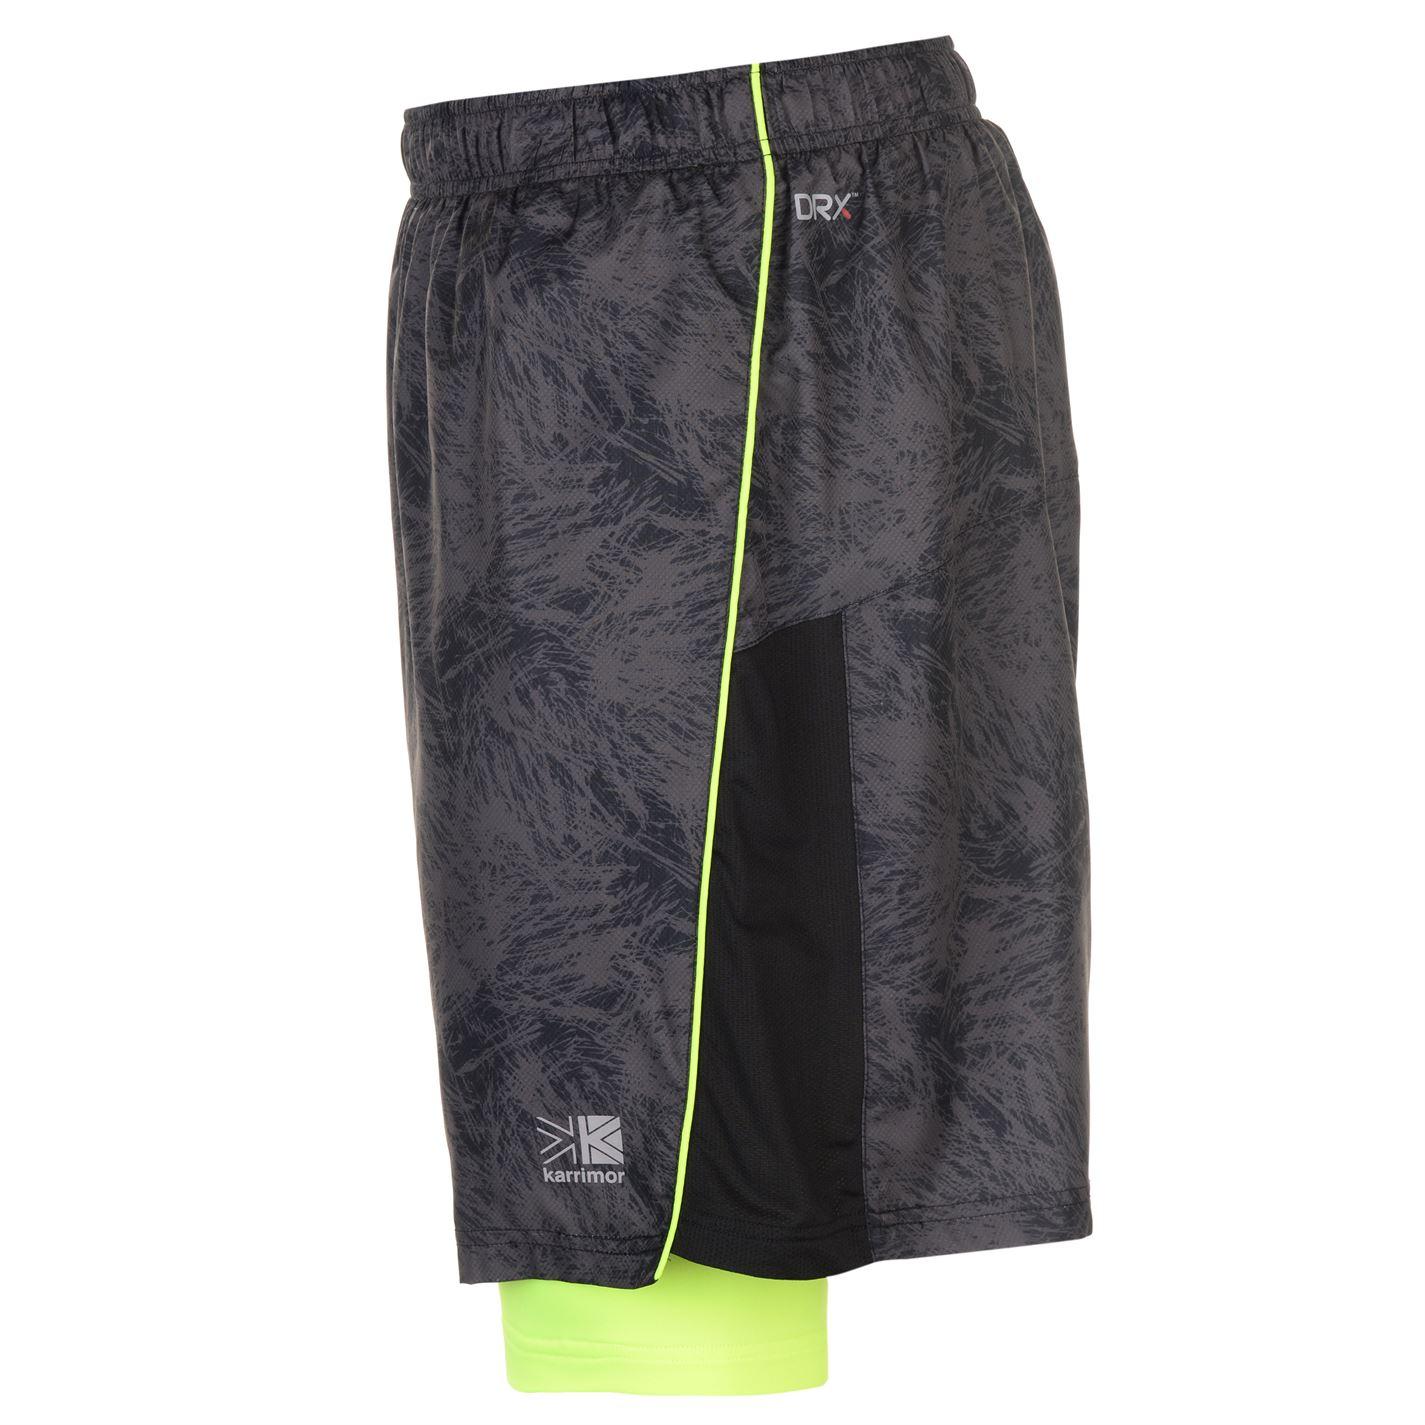 Karrimor-XLite-2in1-Shorts-Performance-Mens thumbnail 14